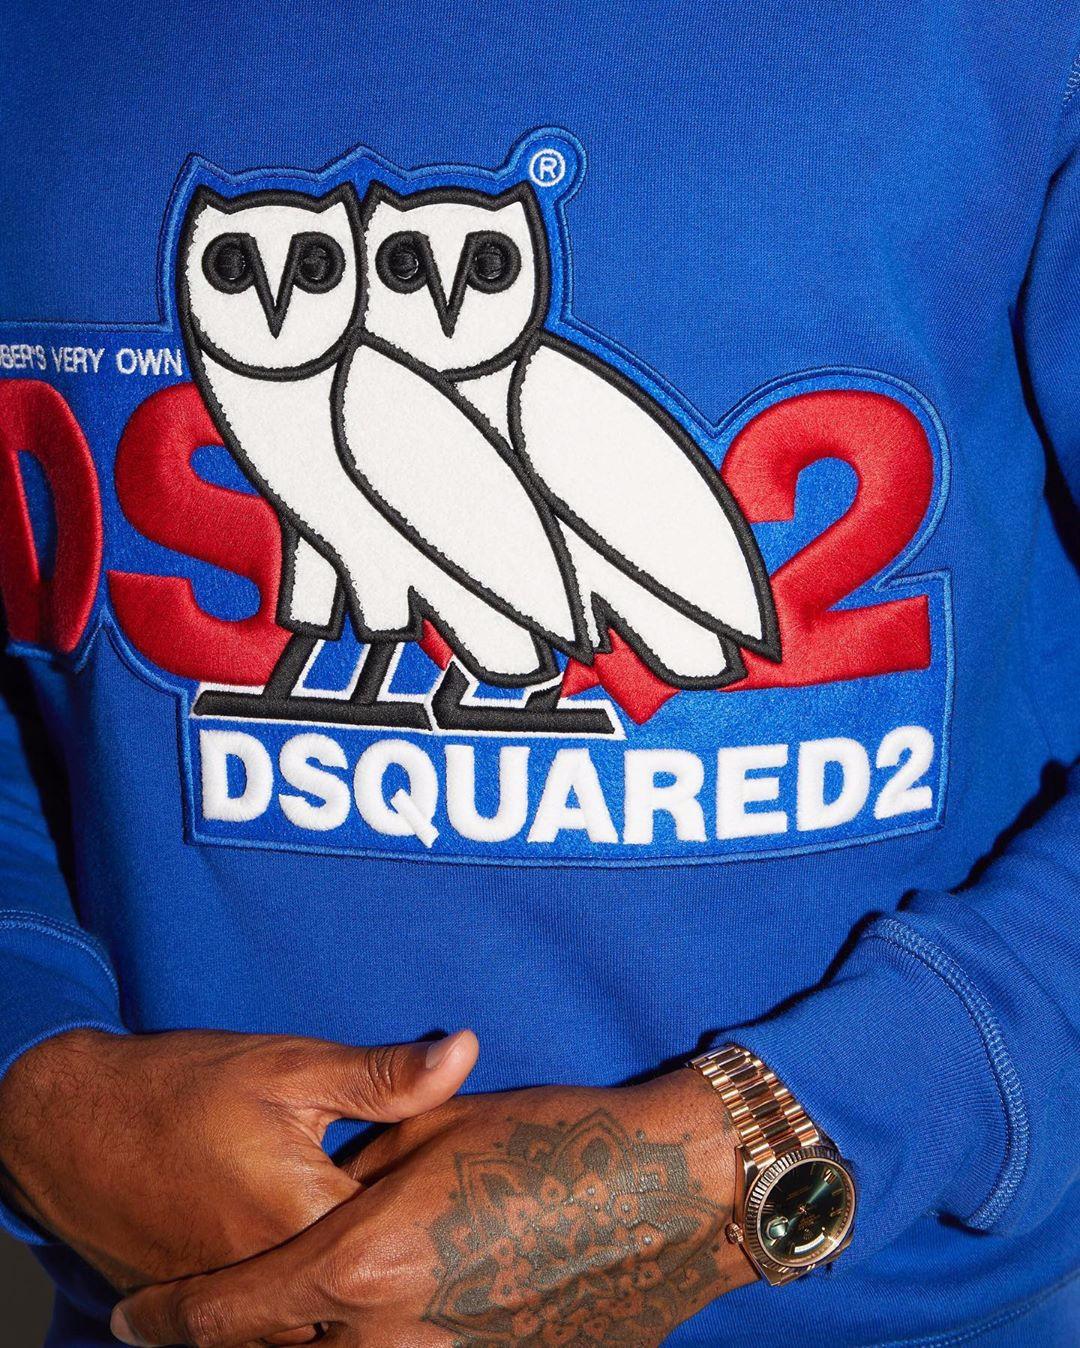 OVO x Dsquared2 co-branding hoodie